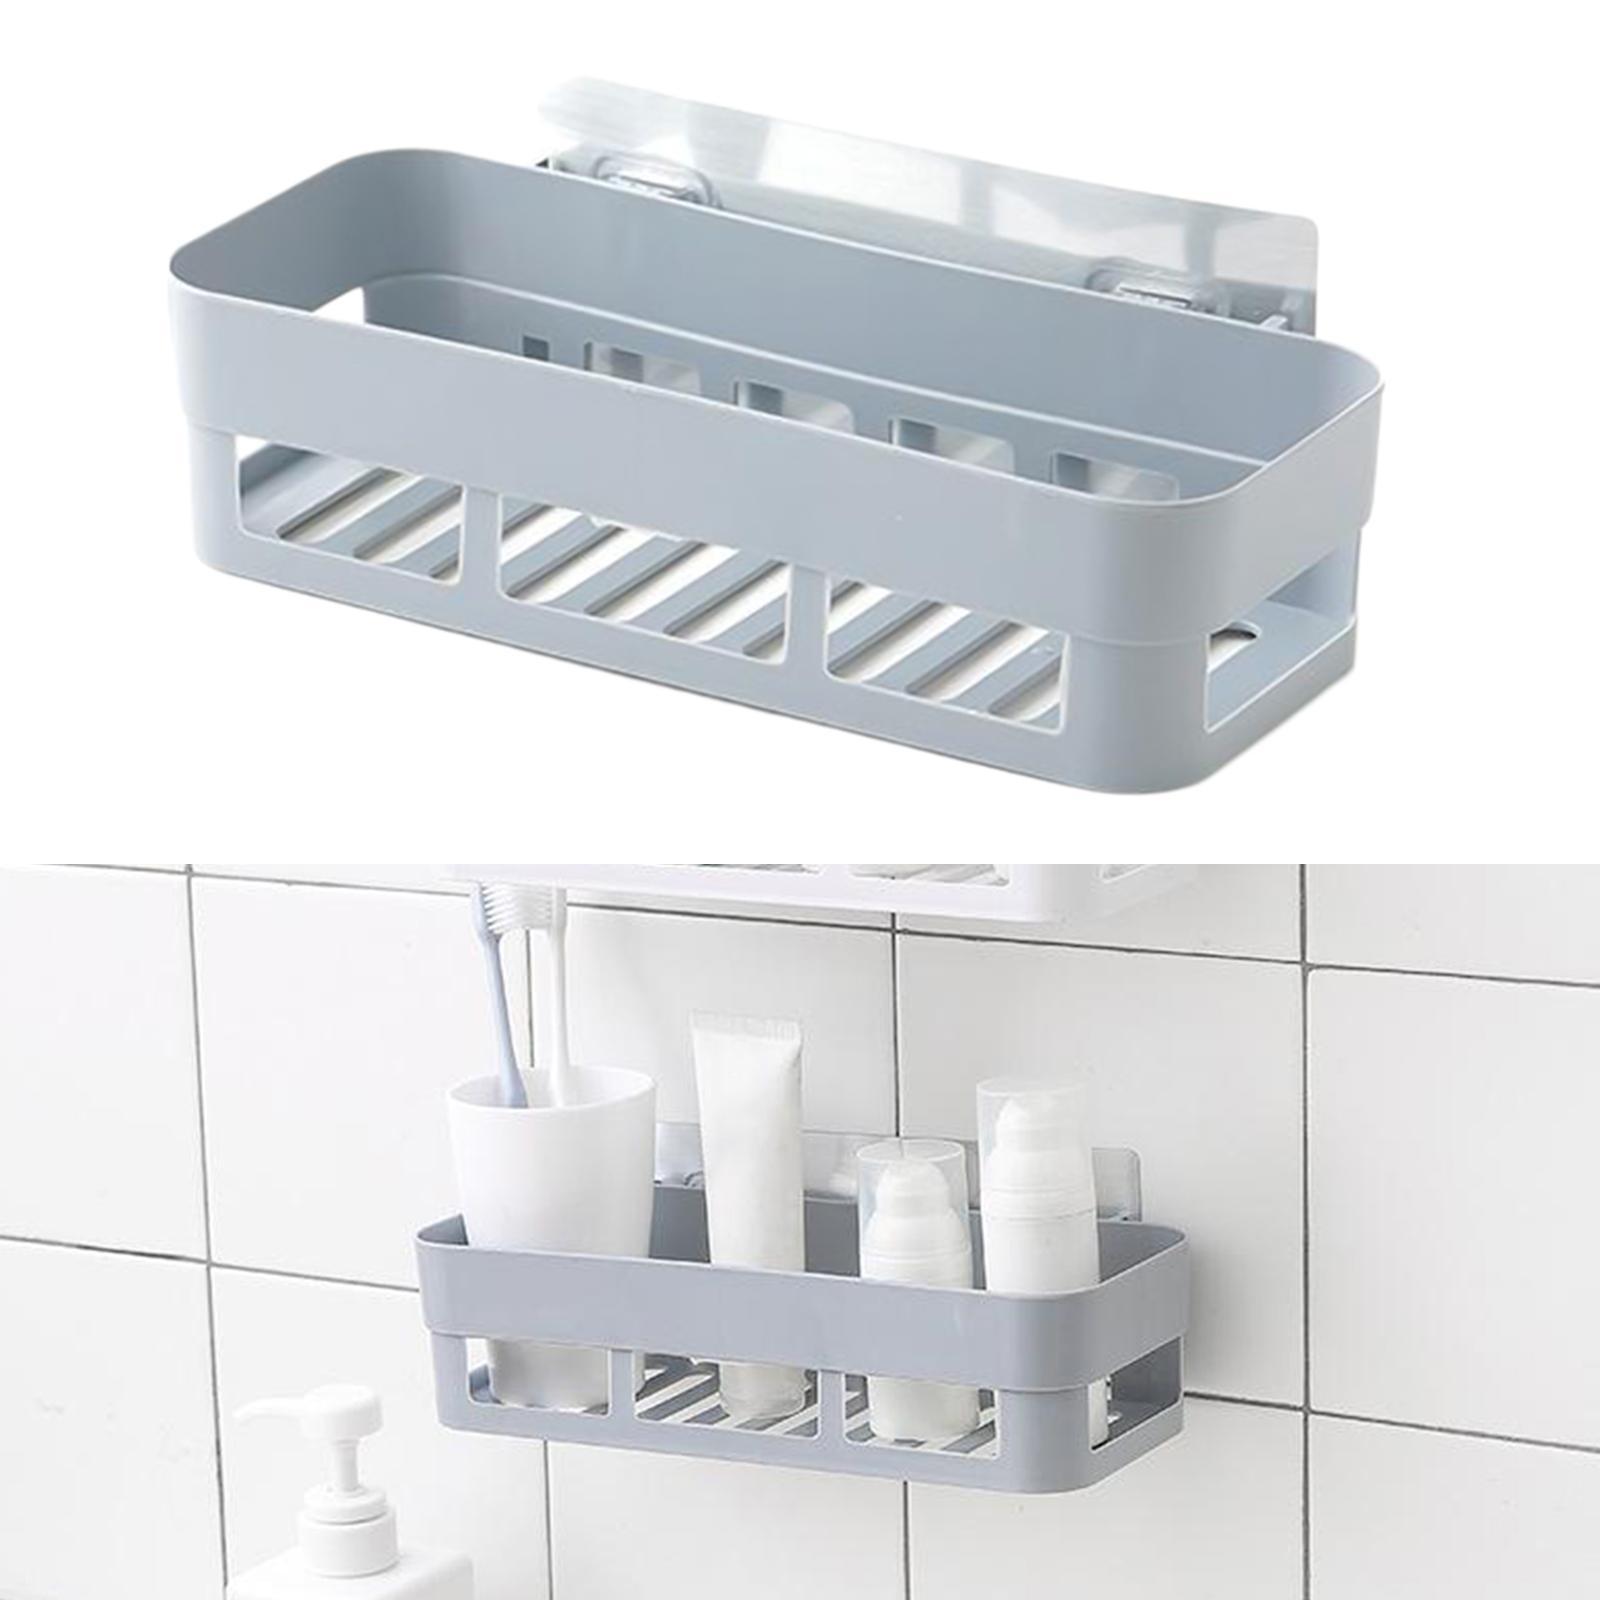 thumbnail 31 - Wall-Suction-Bathroom-Shelf-Shower-Caddy-Wall-Mount-Storage-Rack-Organizer